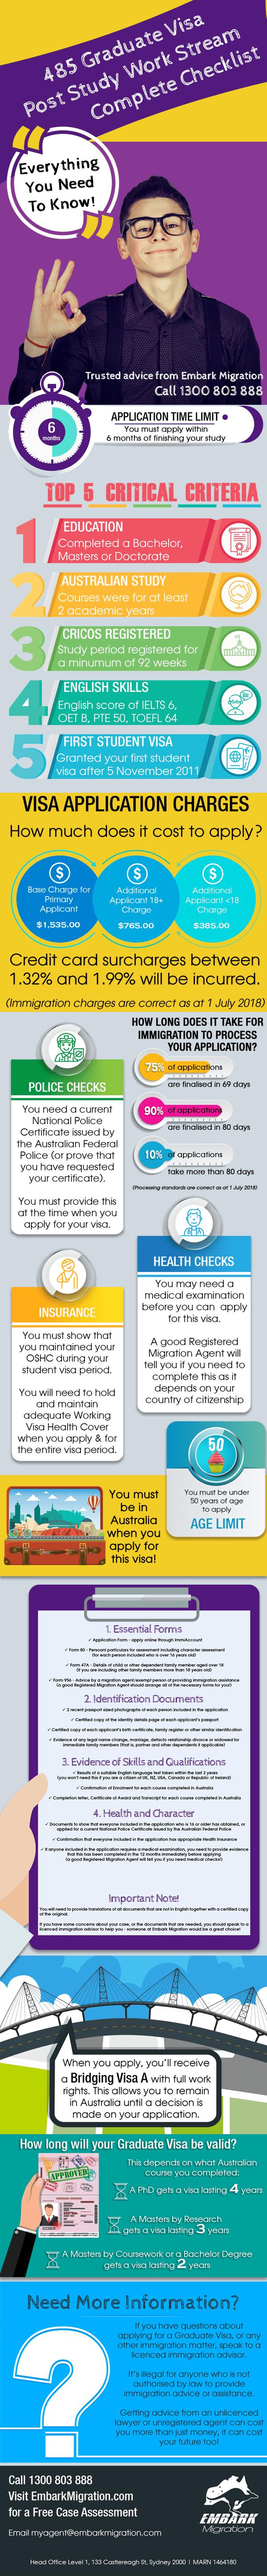 485 Graduate Visa Post Study Work Stream Complete Checklist